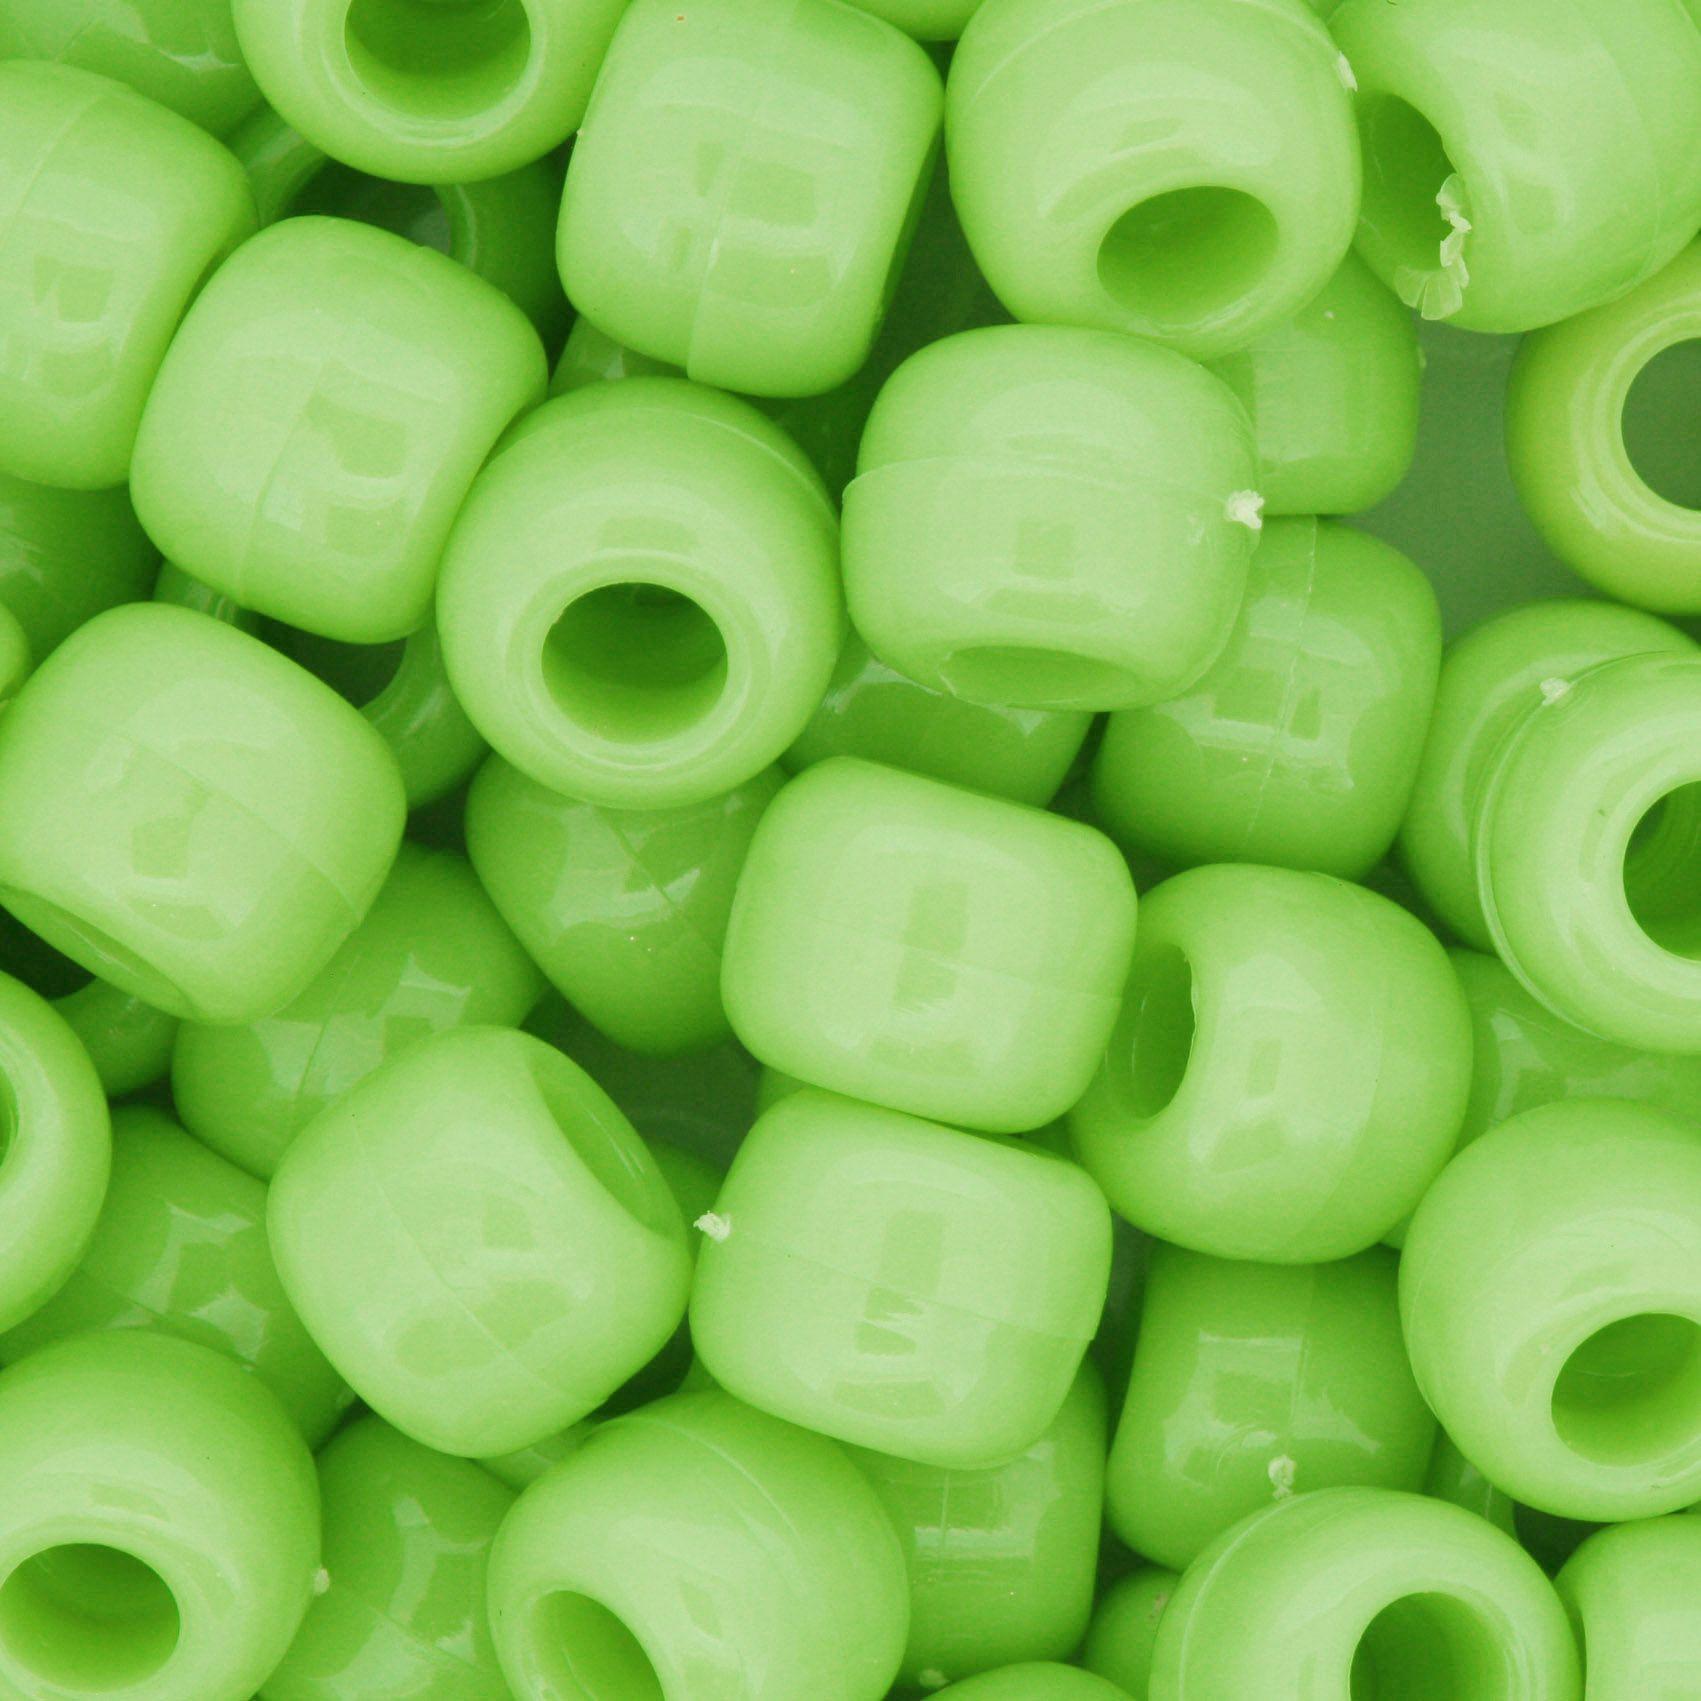 Miçangão Plástico - Tererê® - Verde Neon  - Stéphanie Bijoux® - Peças para Bijuterias e Artesanato